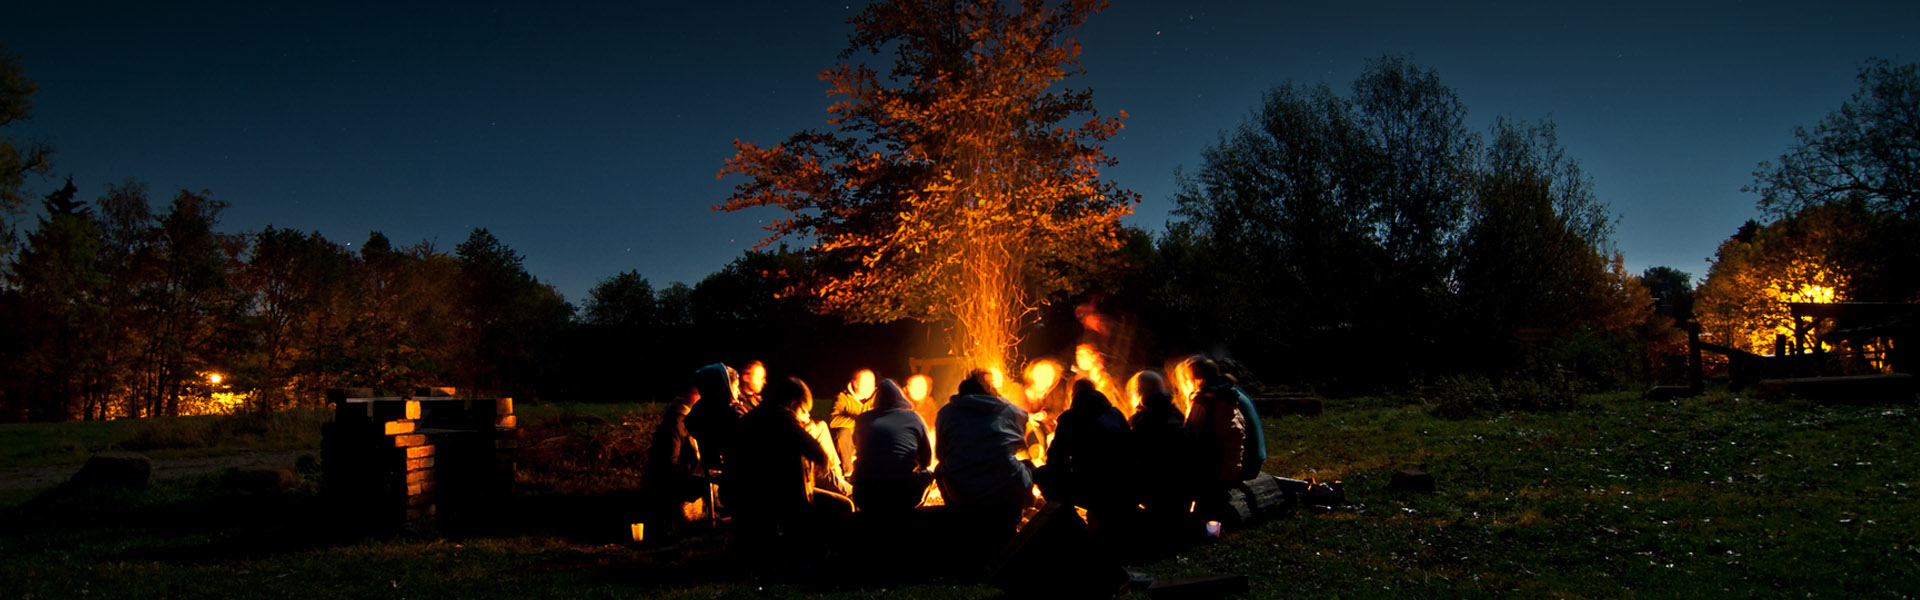 HB_WebSliders_Camp Fire